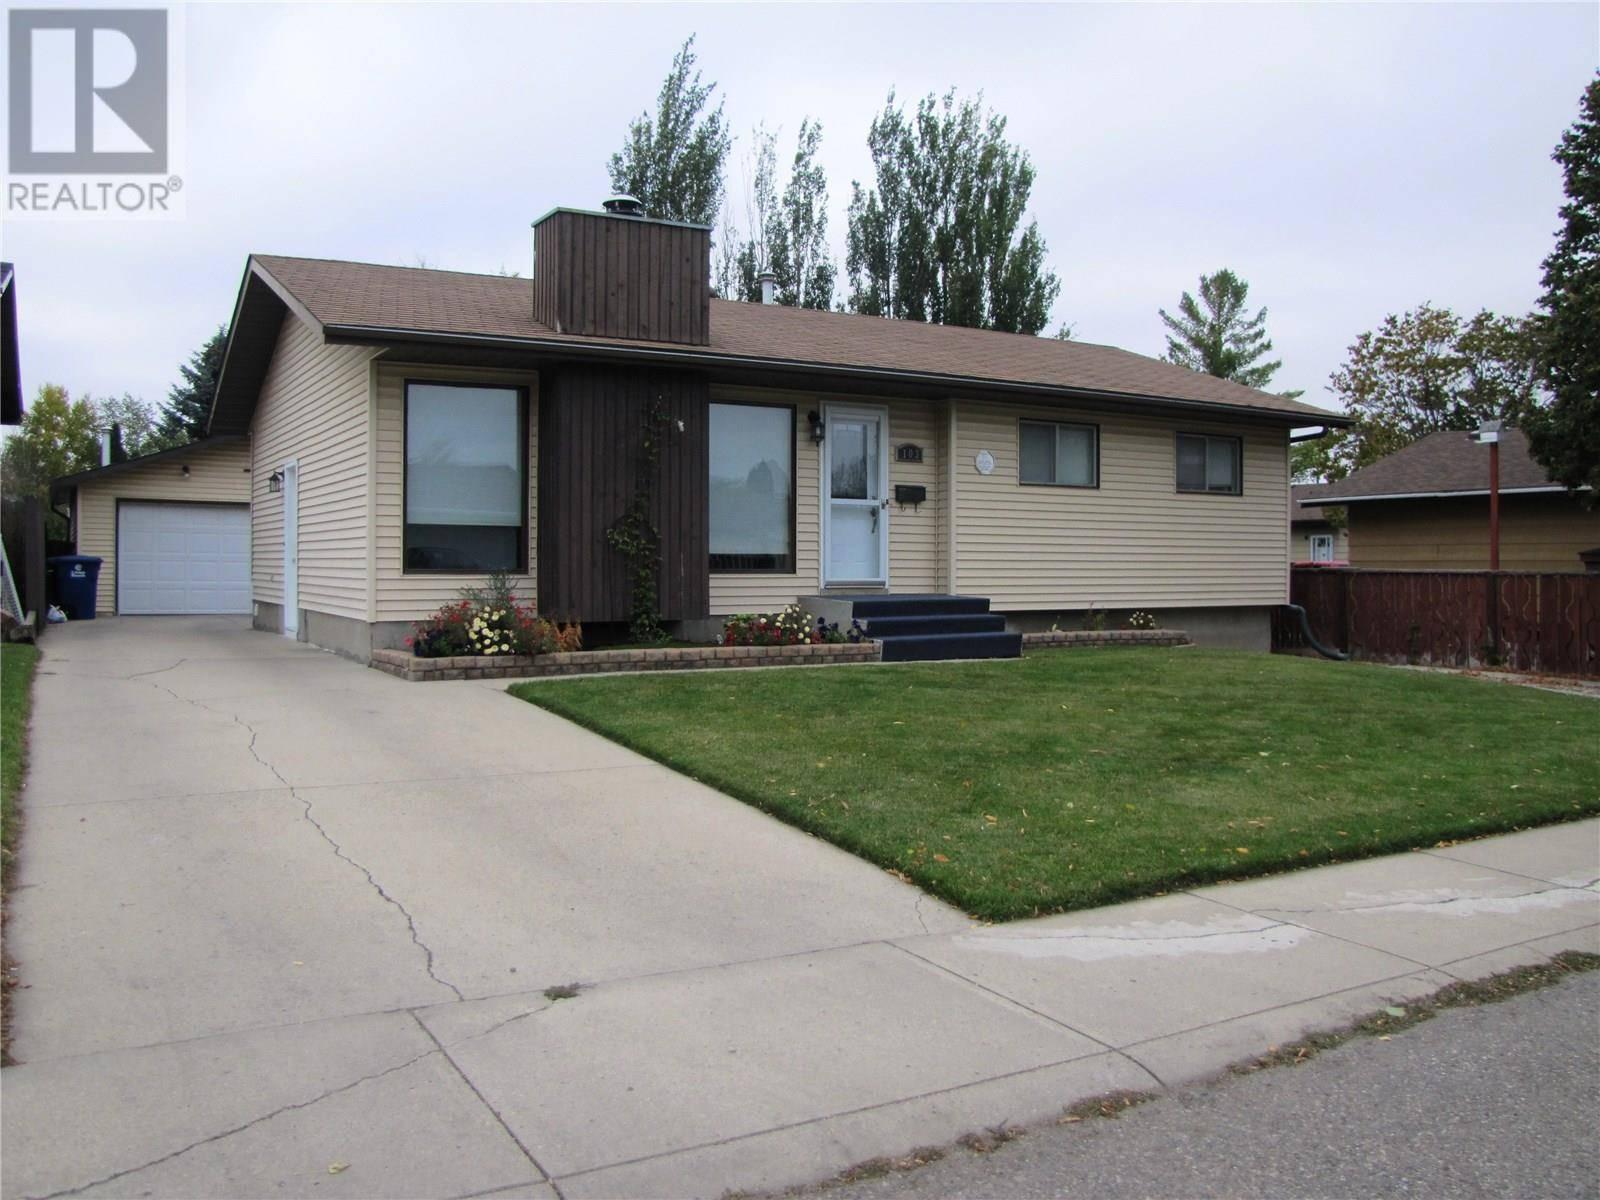 House for sale at 103 O'regan Cres Saskatoon Saskatchewan - MLS: SK788404